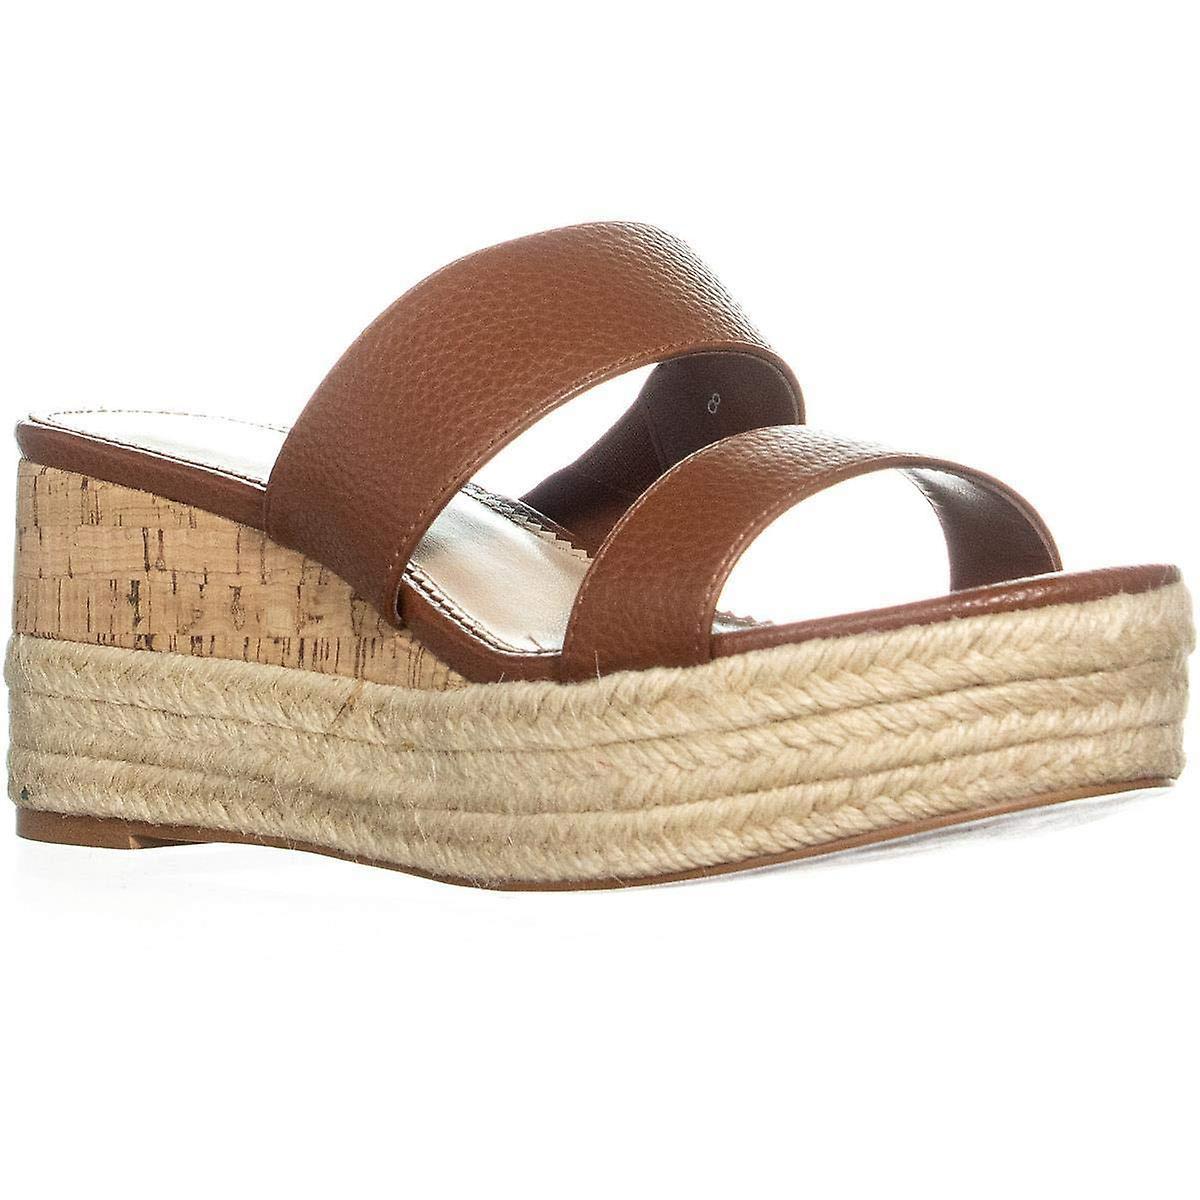 Callisto Womens Foundation Leather Open Toe Casual Slide Sandals